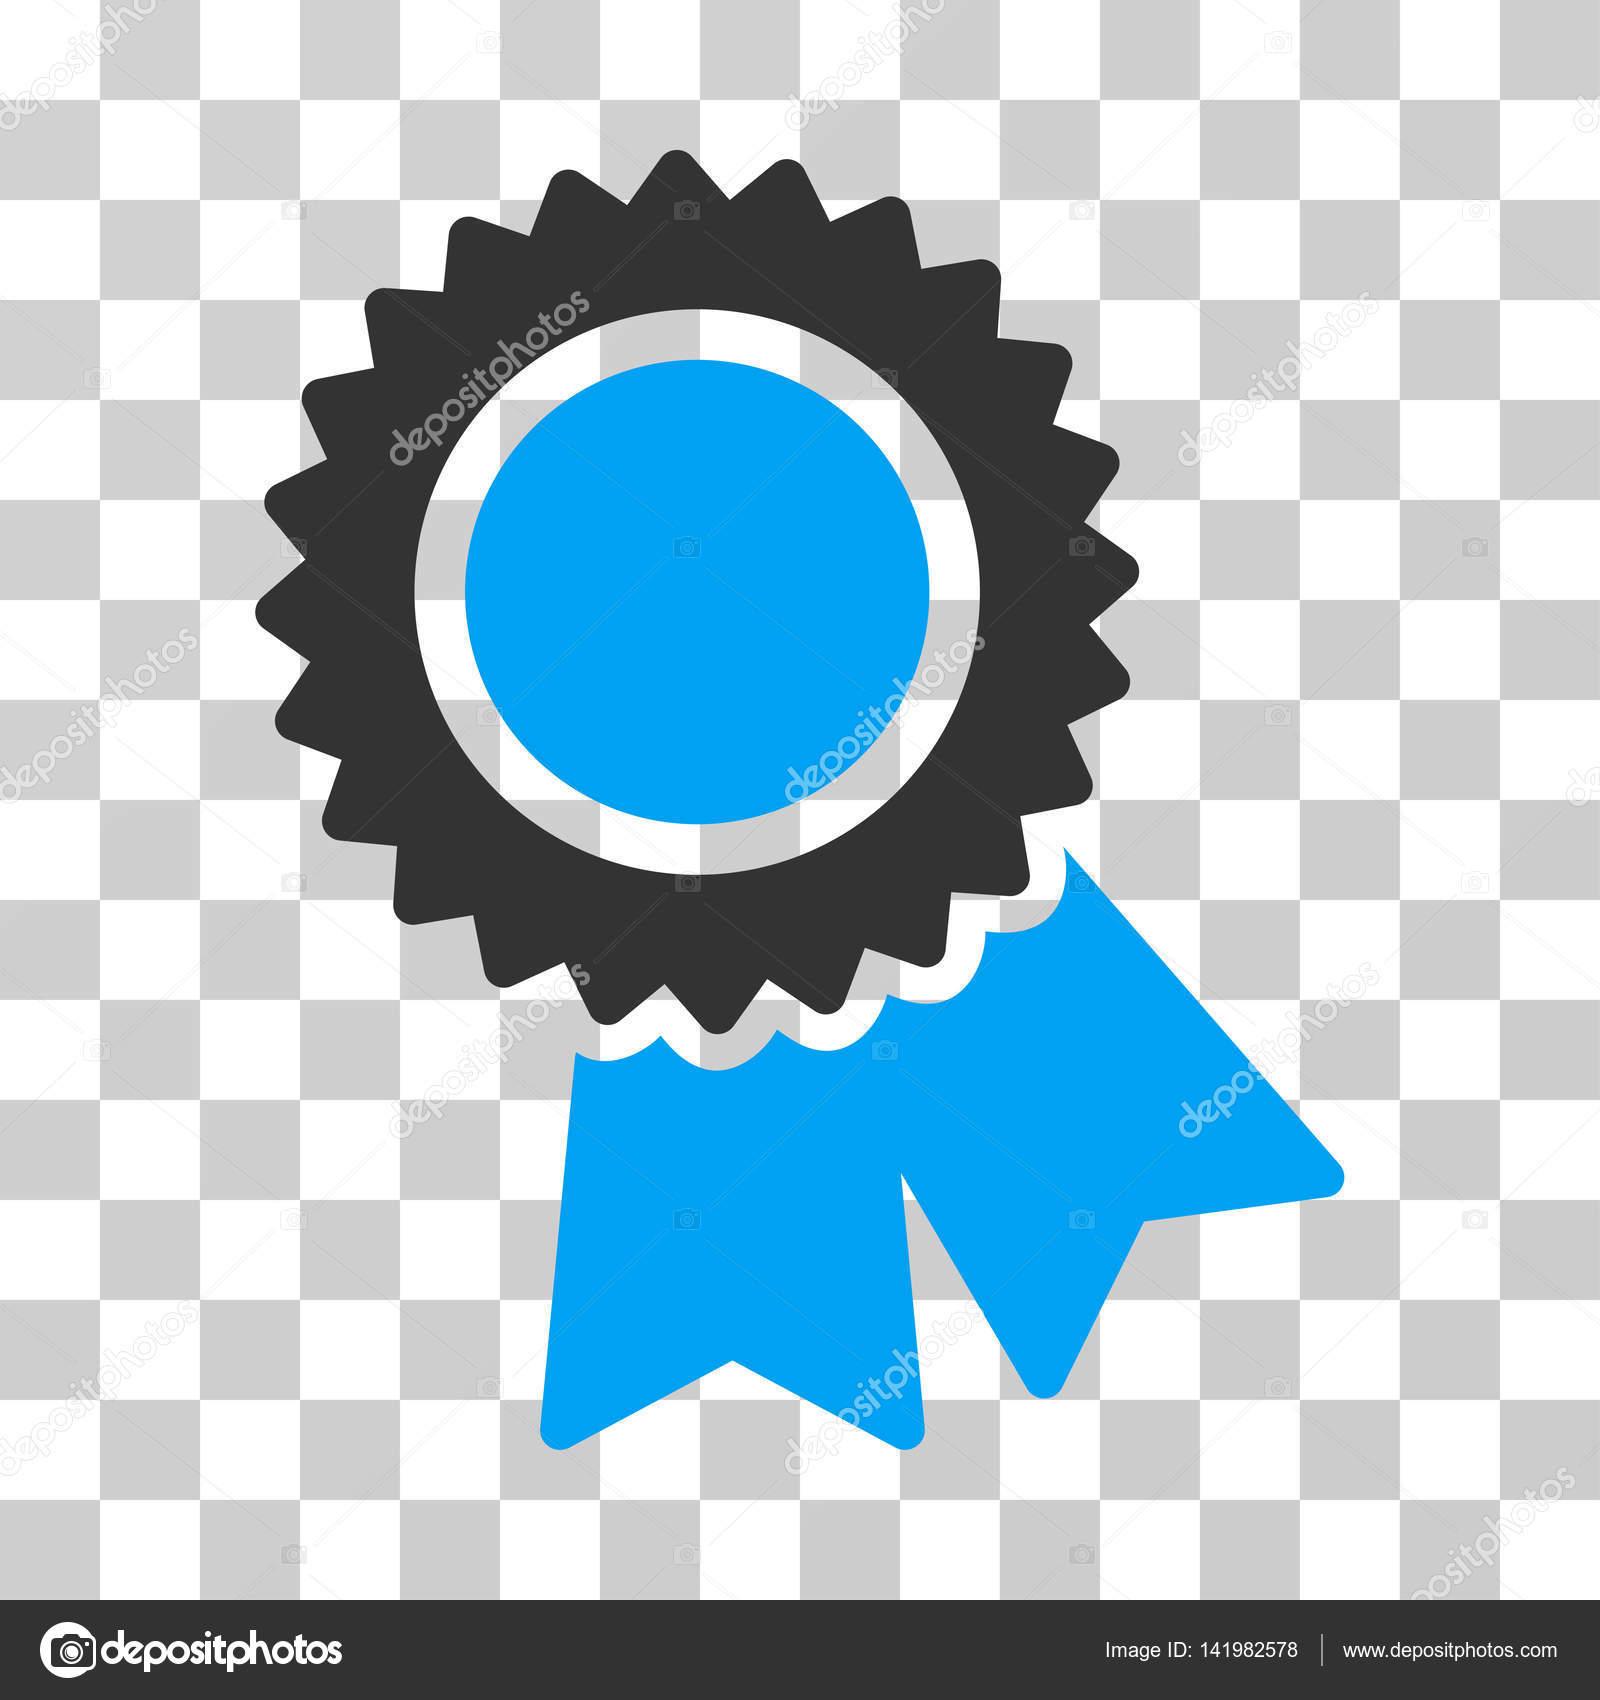 Certification Vector Icon Stock Vector Ahasoft 141982578